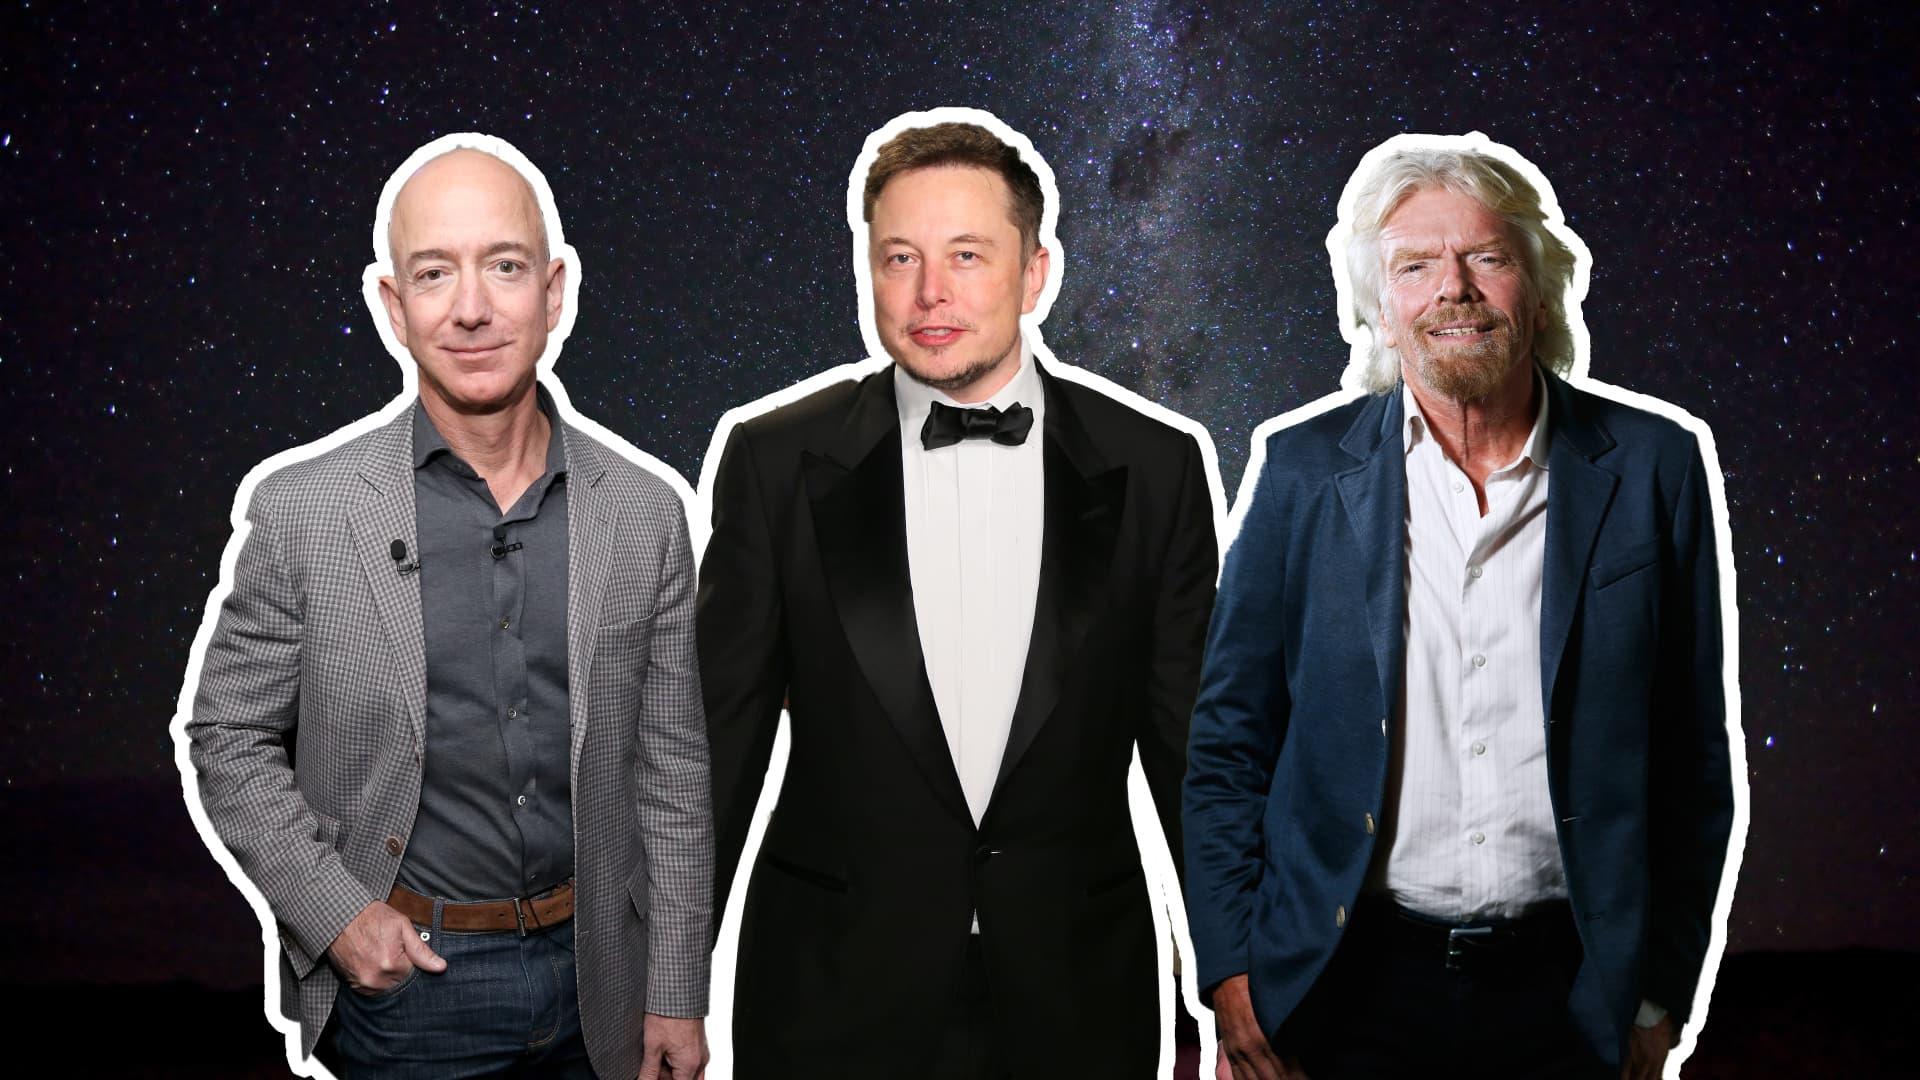 Nasa Astronaut Terry Virts On Jeff Bezos Versus Elon Musk Space Race